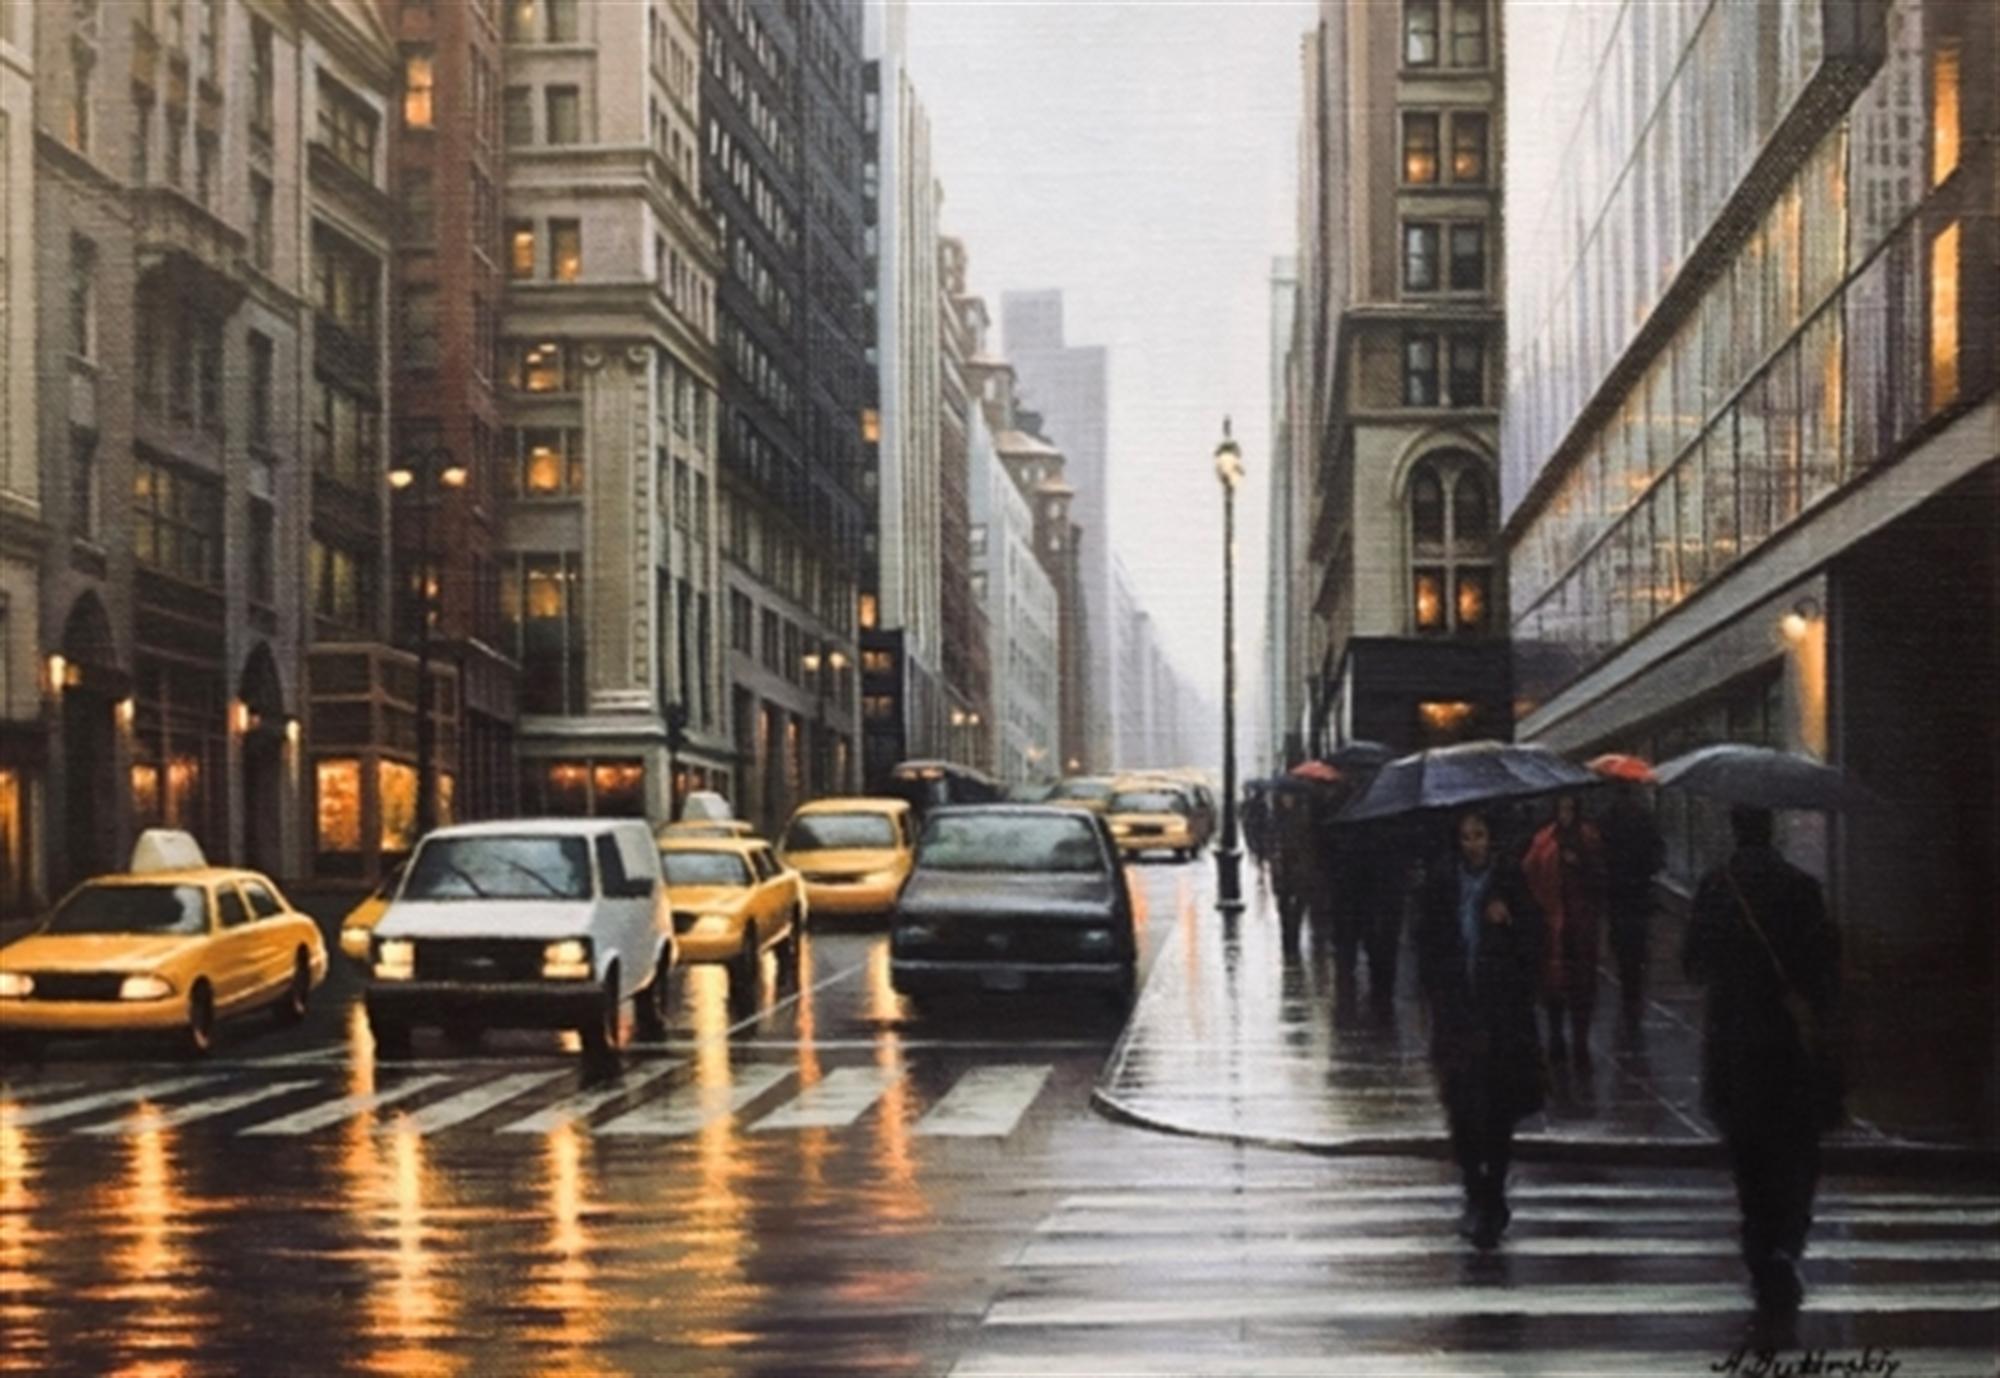 New York Cabbies by Alexei Butirskiy